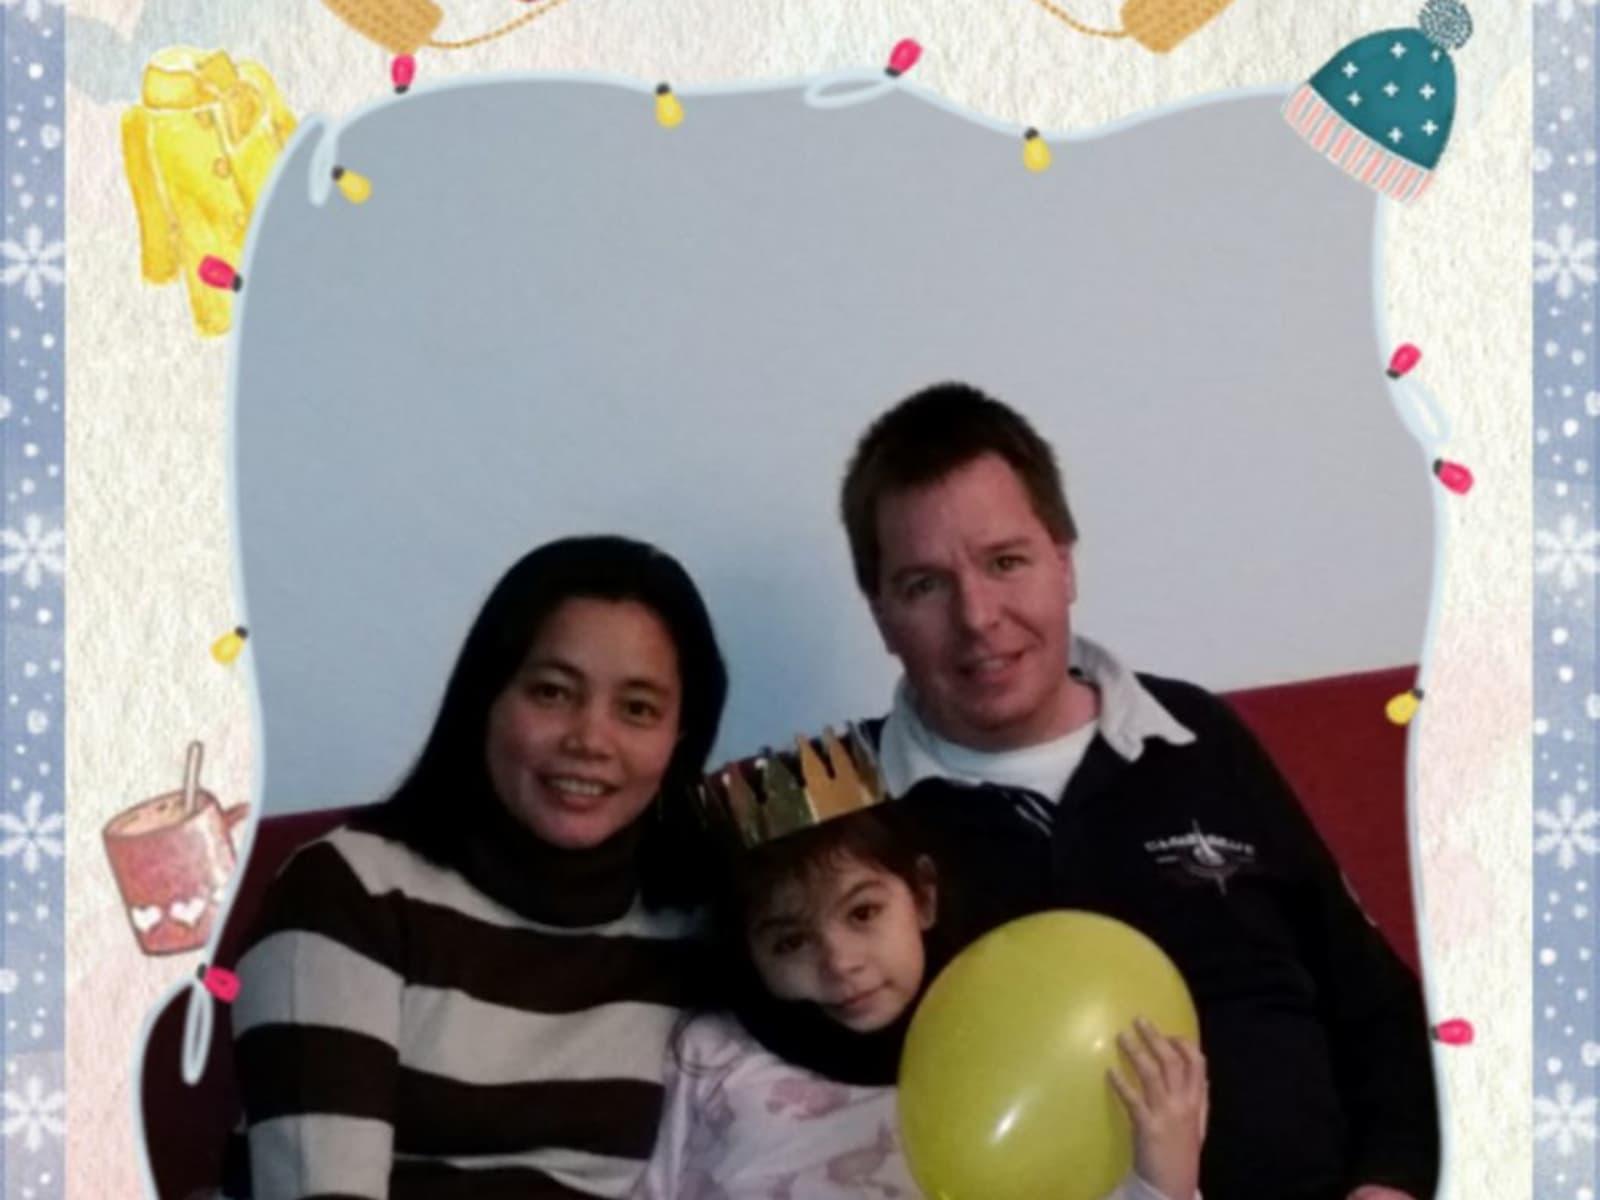 Martin & Johanna from Dumaguete, Philippines